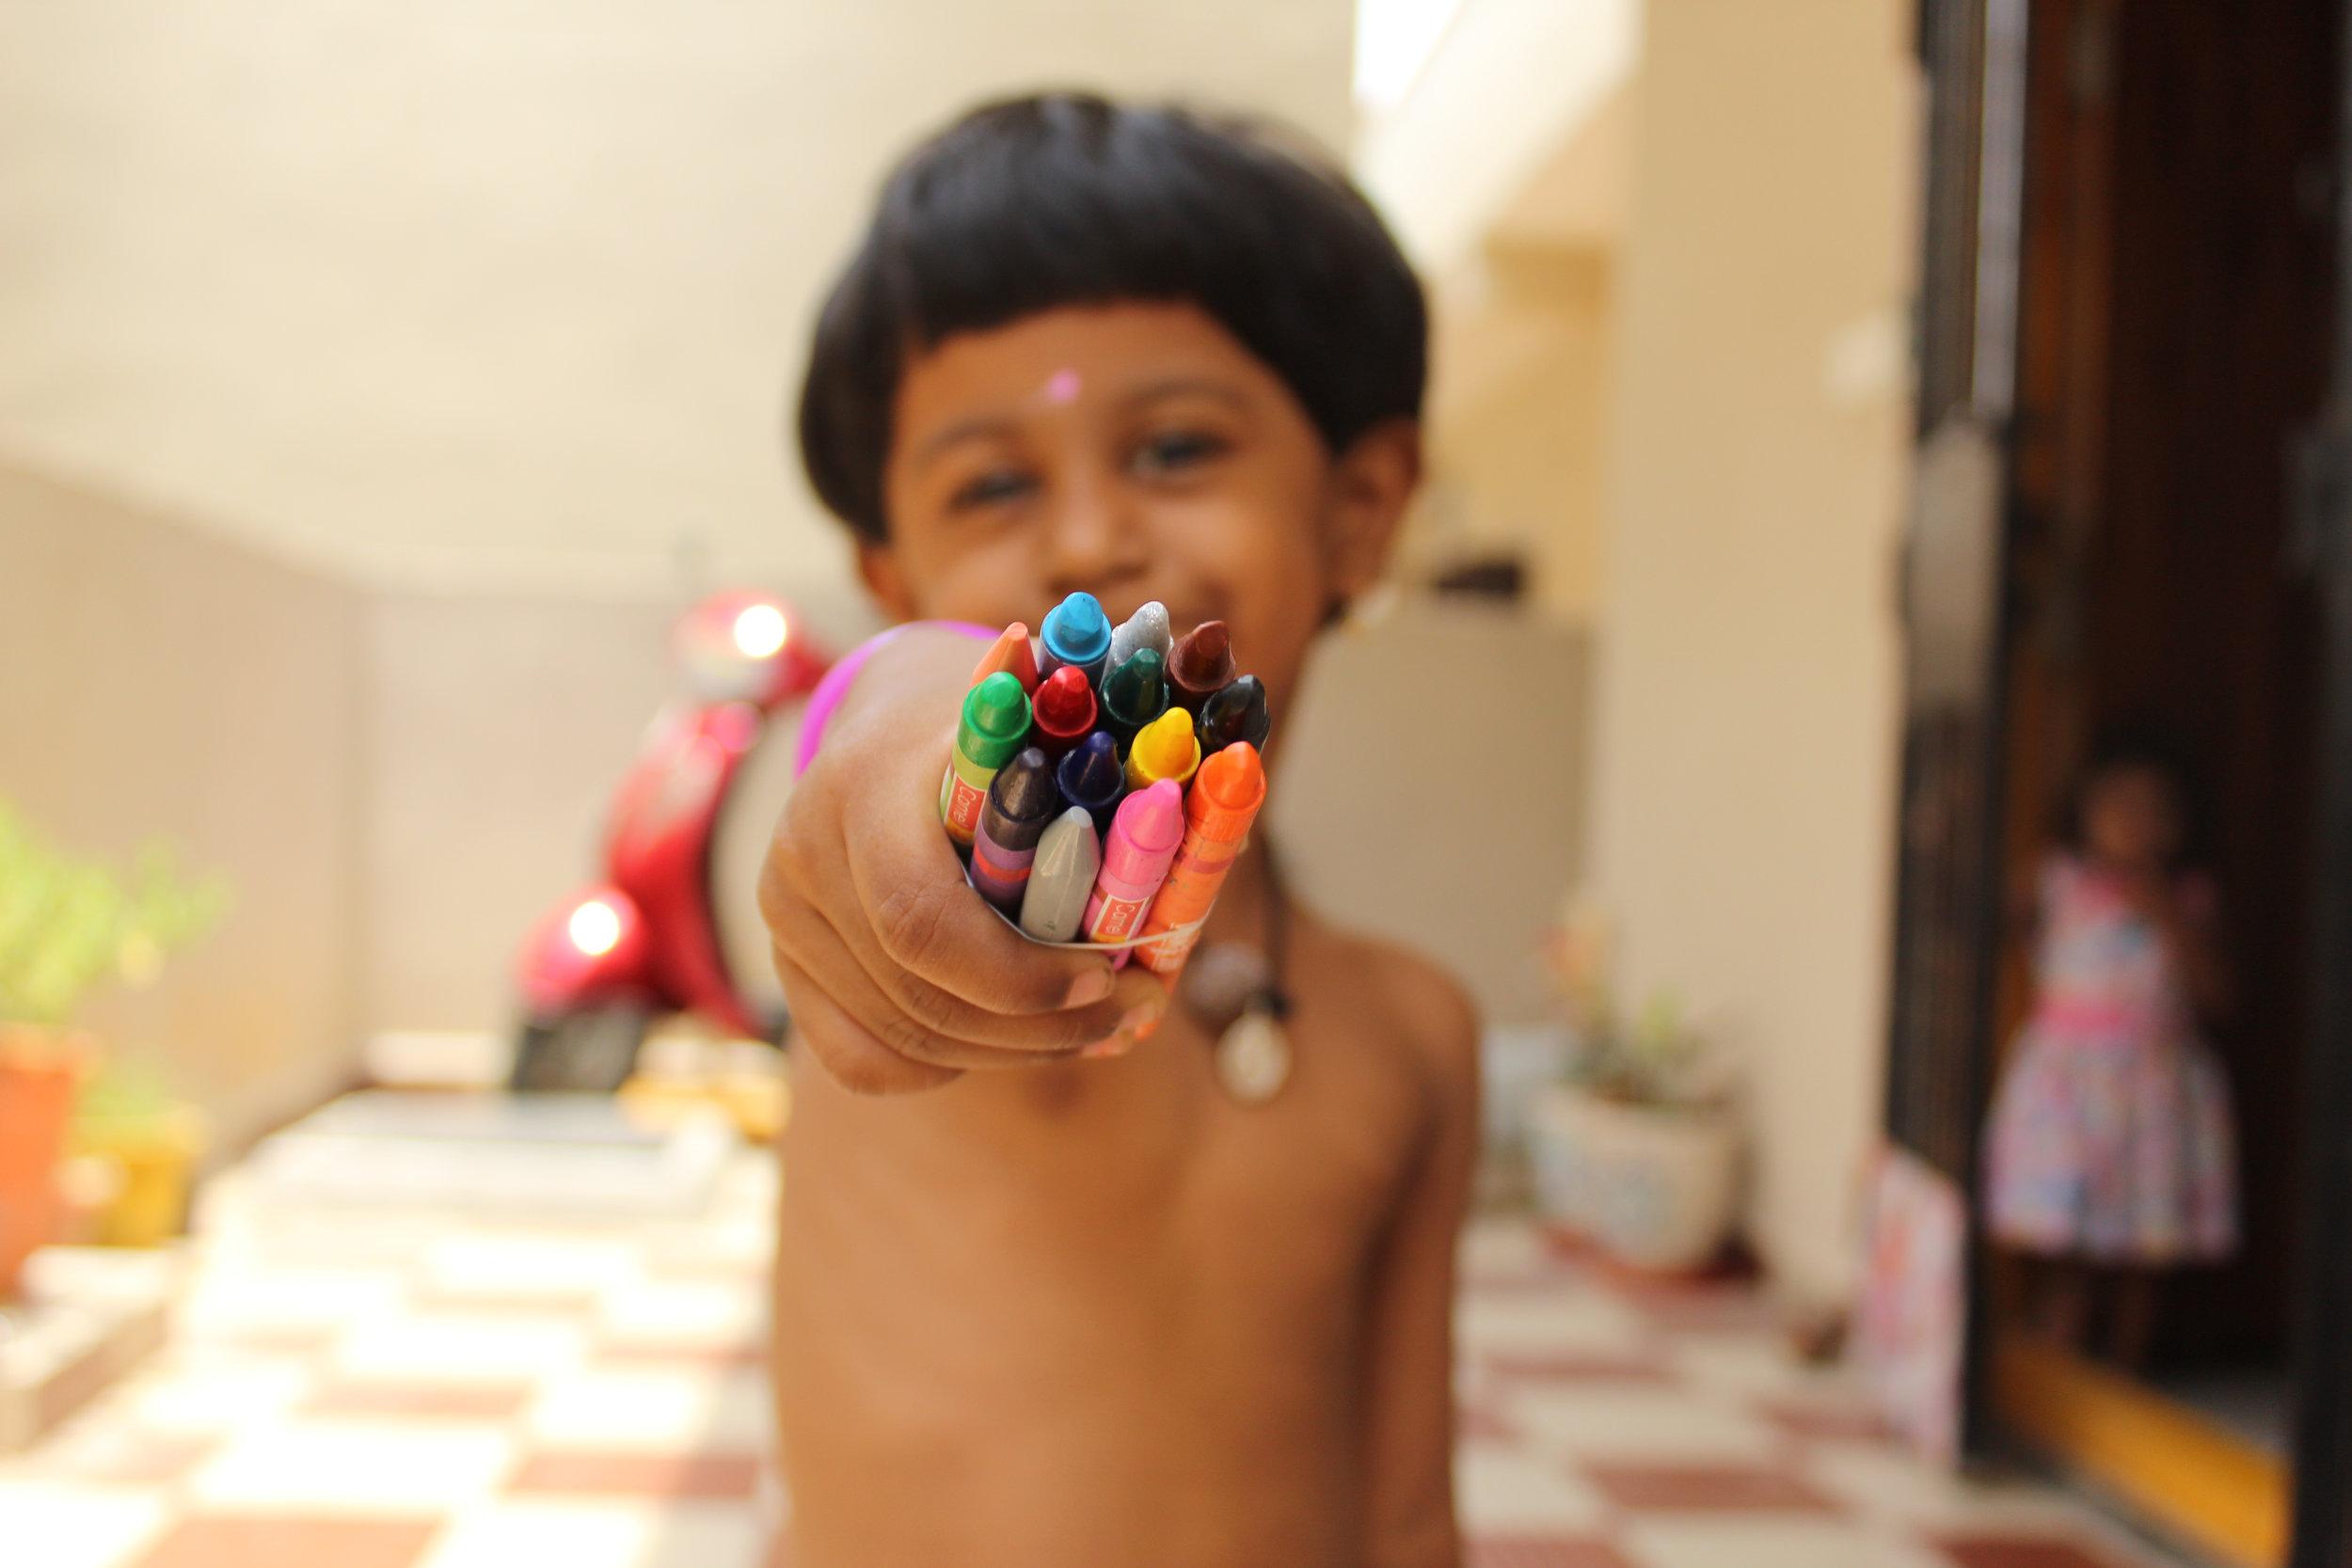 Boy Holding Crayons.jpg